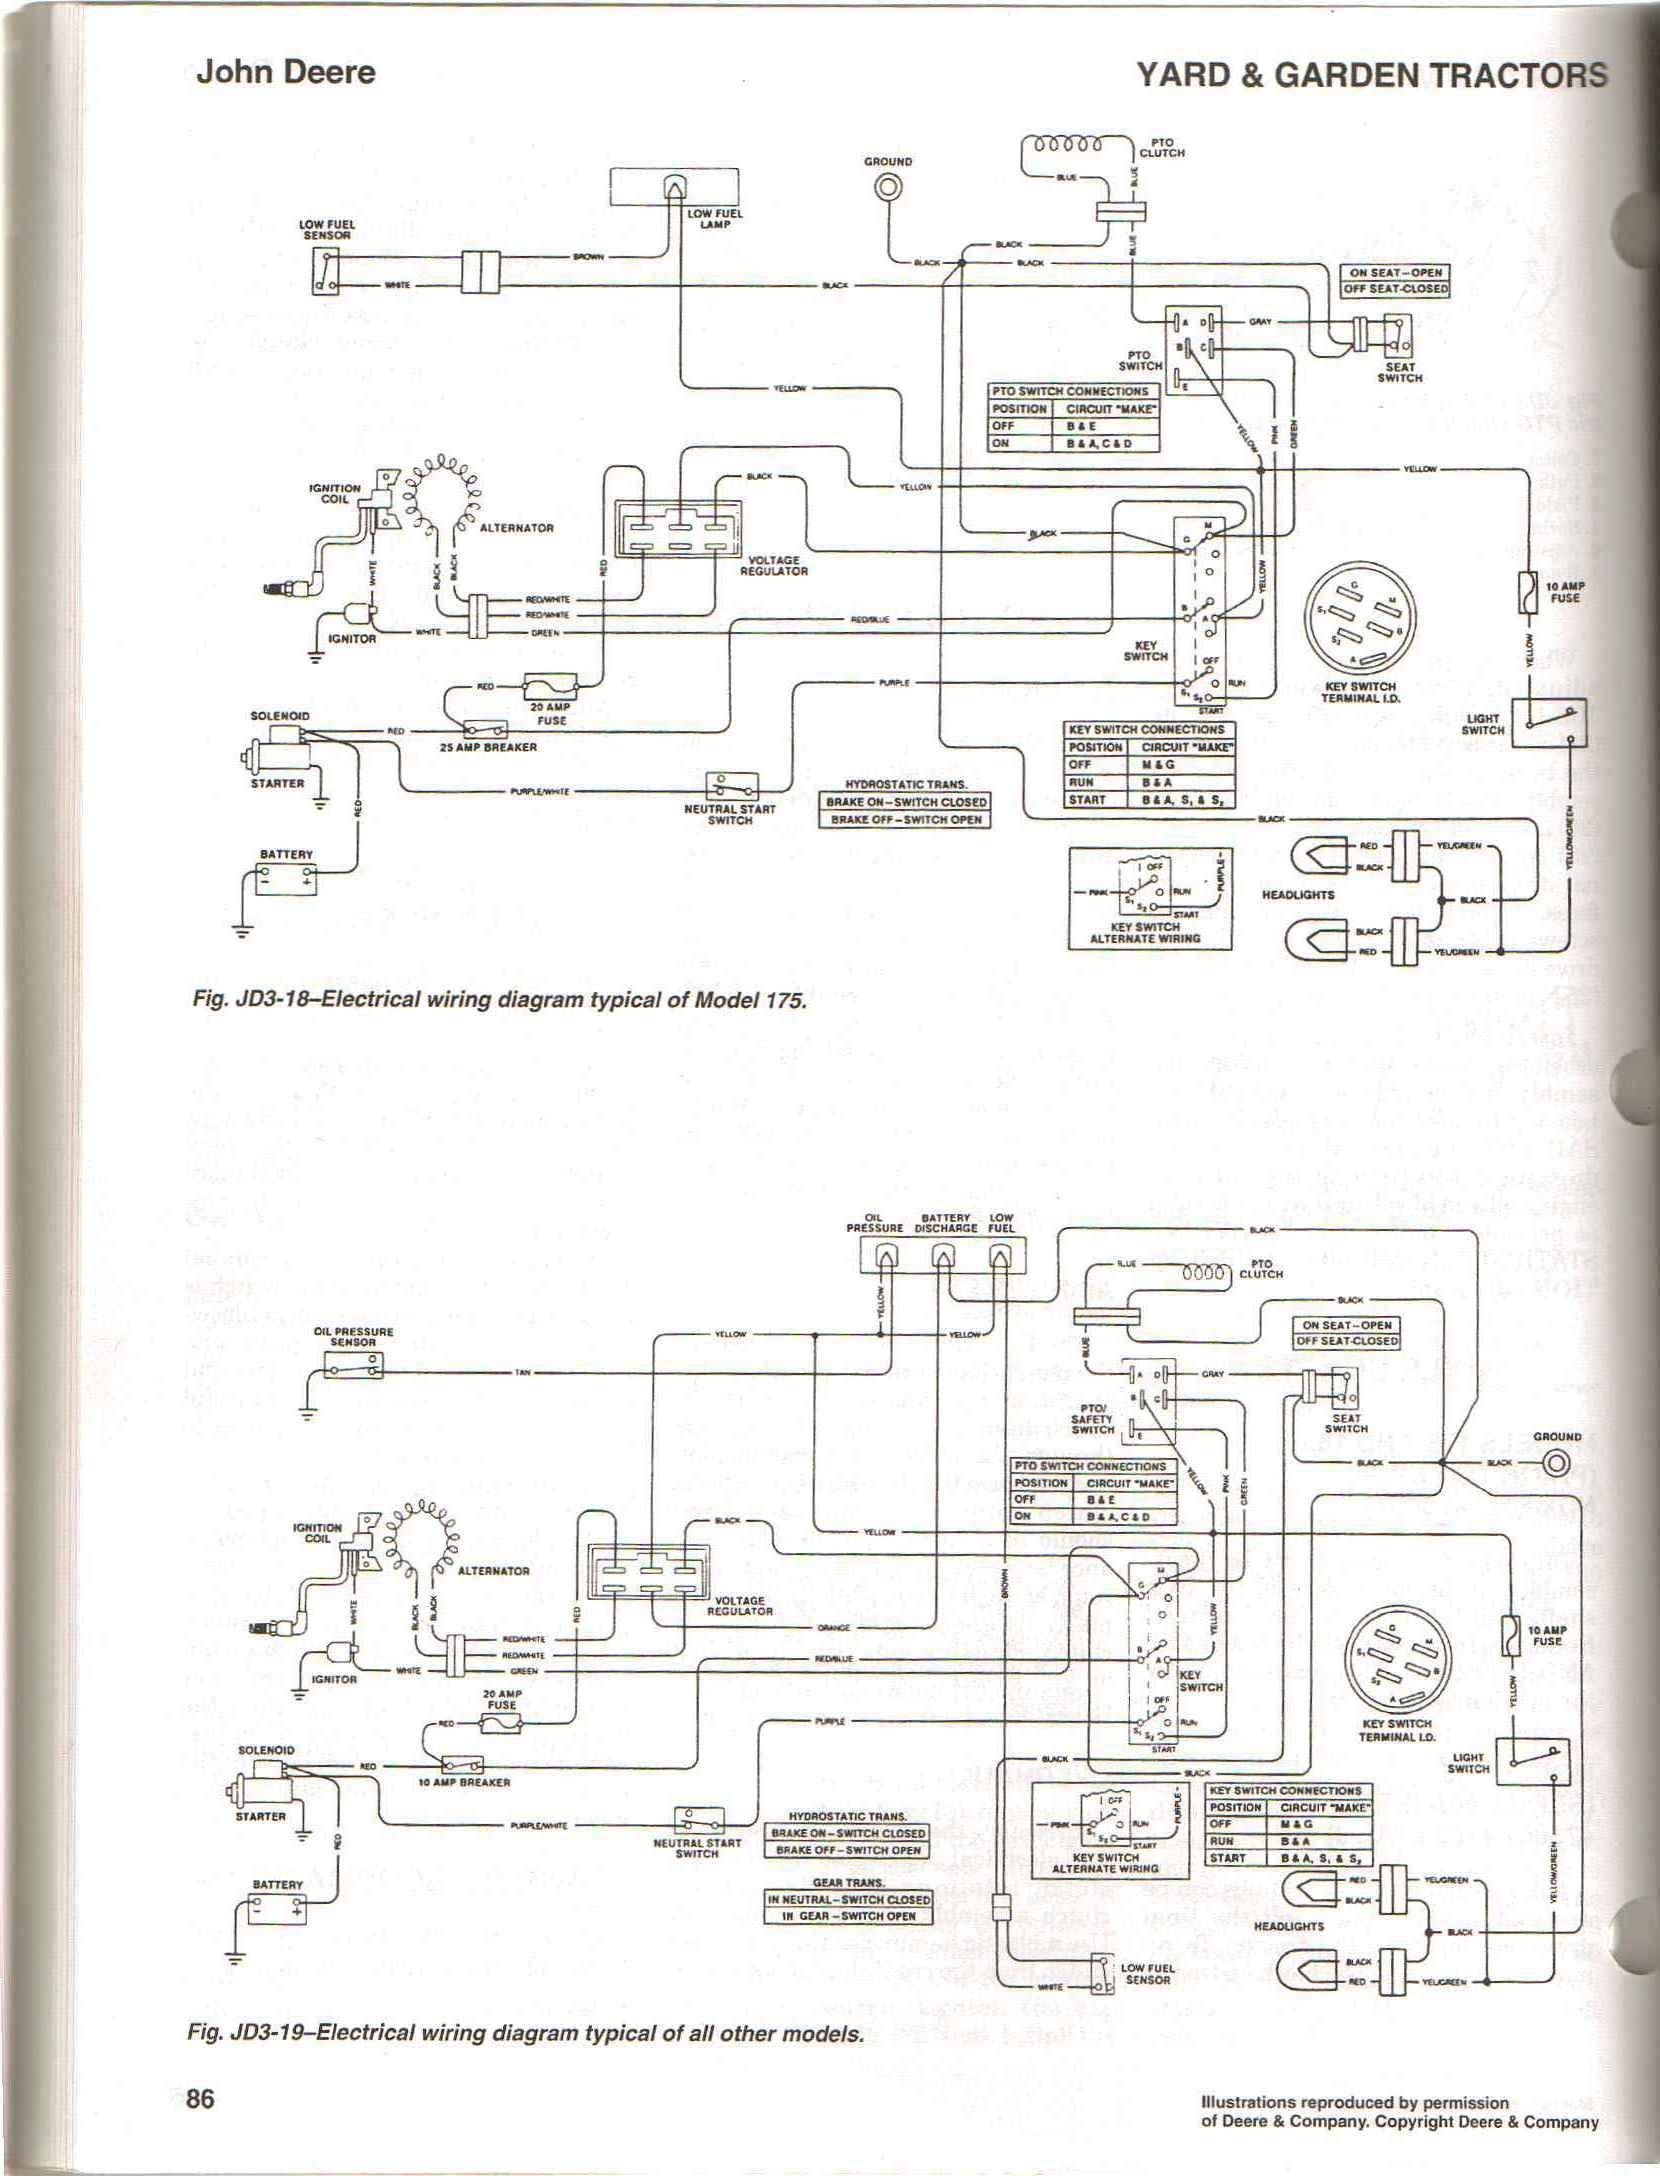 Gator Xuv 620i Wiring Diagram John Deere Problems Fuse Box Somurich Com 2008 Specs